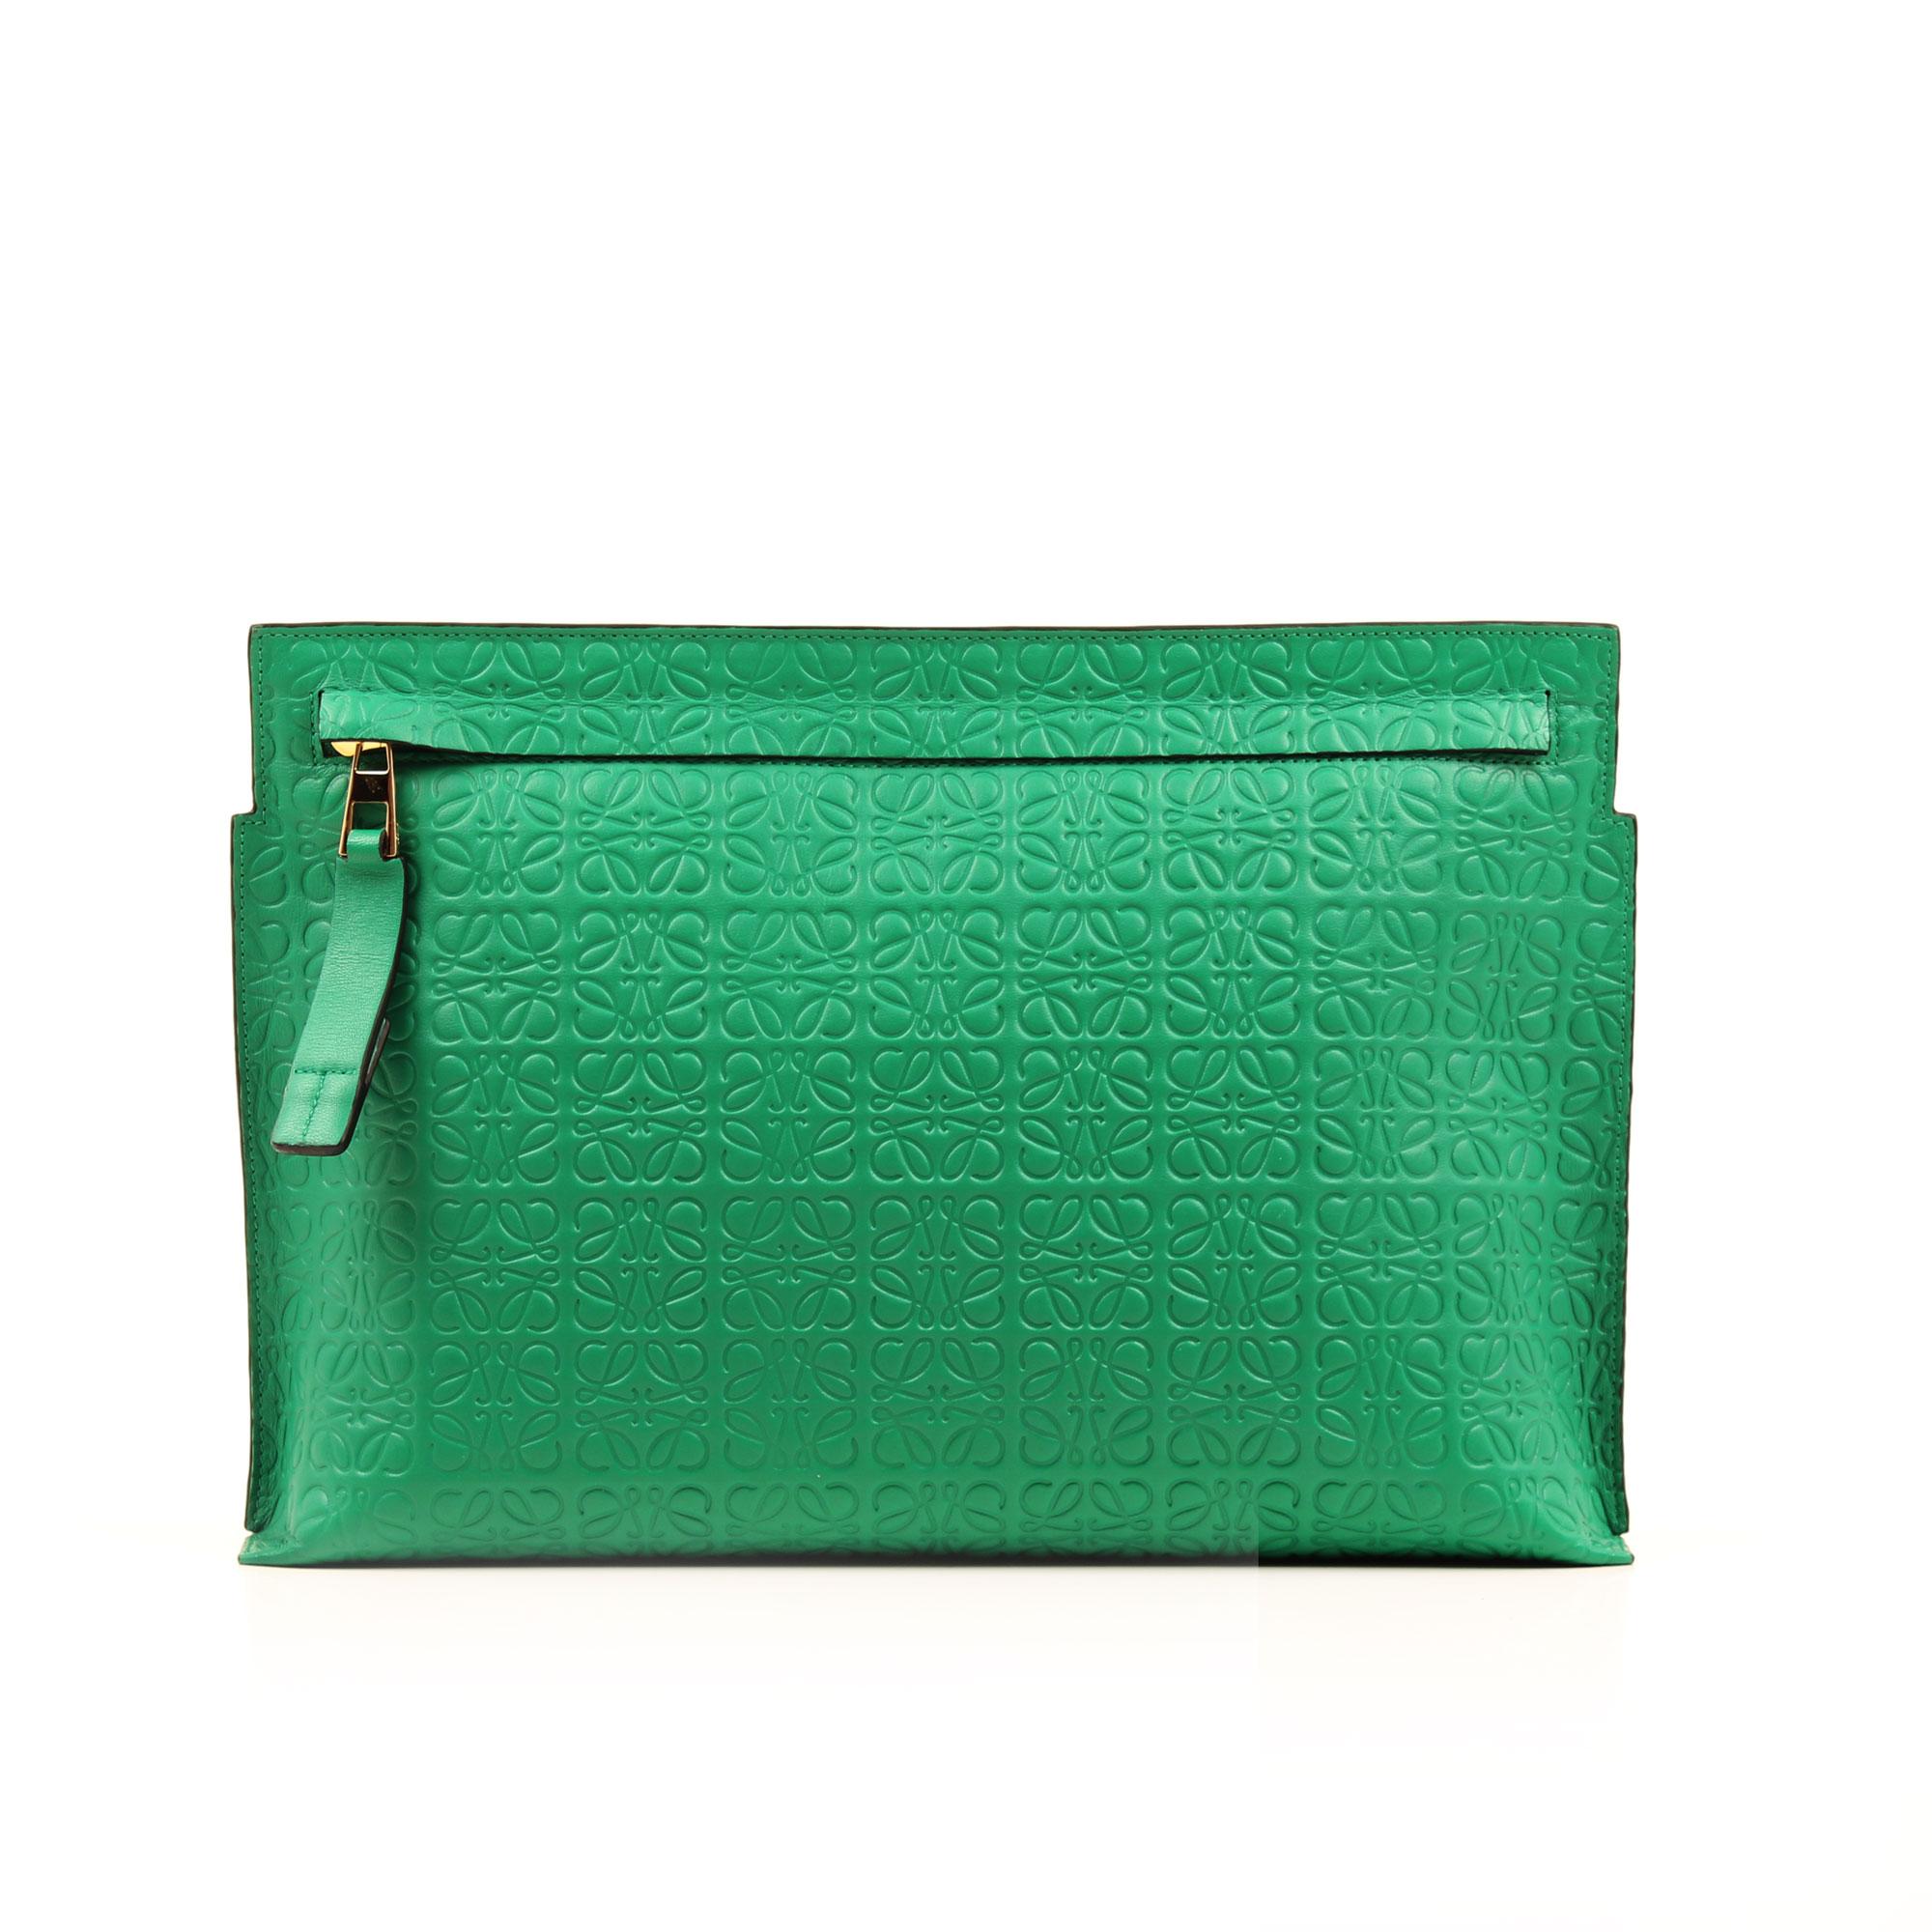 Imagen frontal del bolso clutch loewe t pouch verde embossed